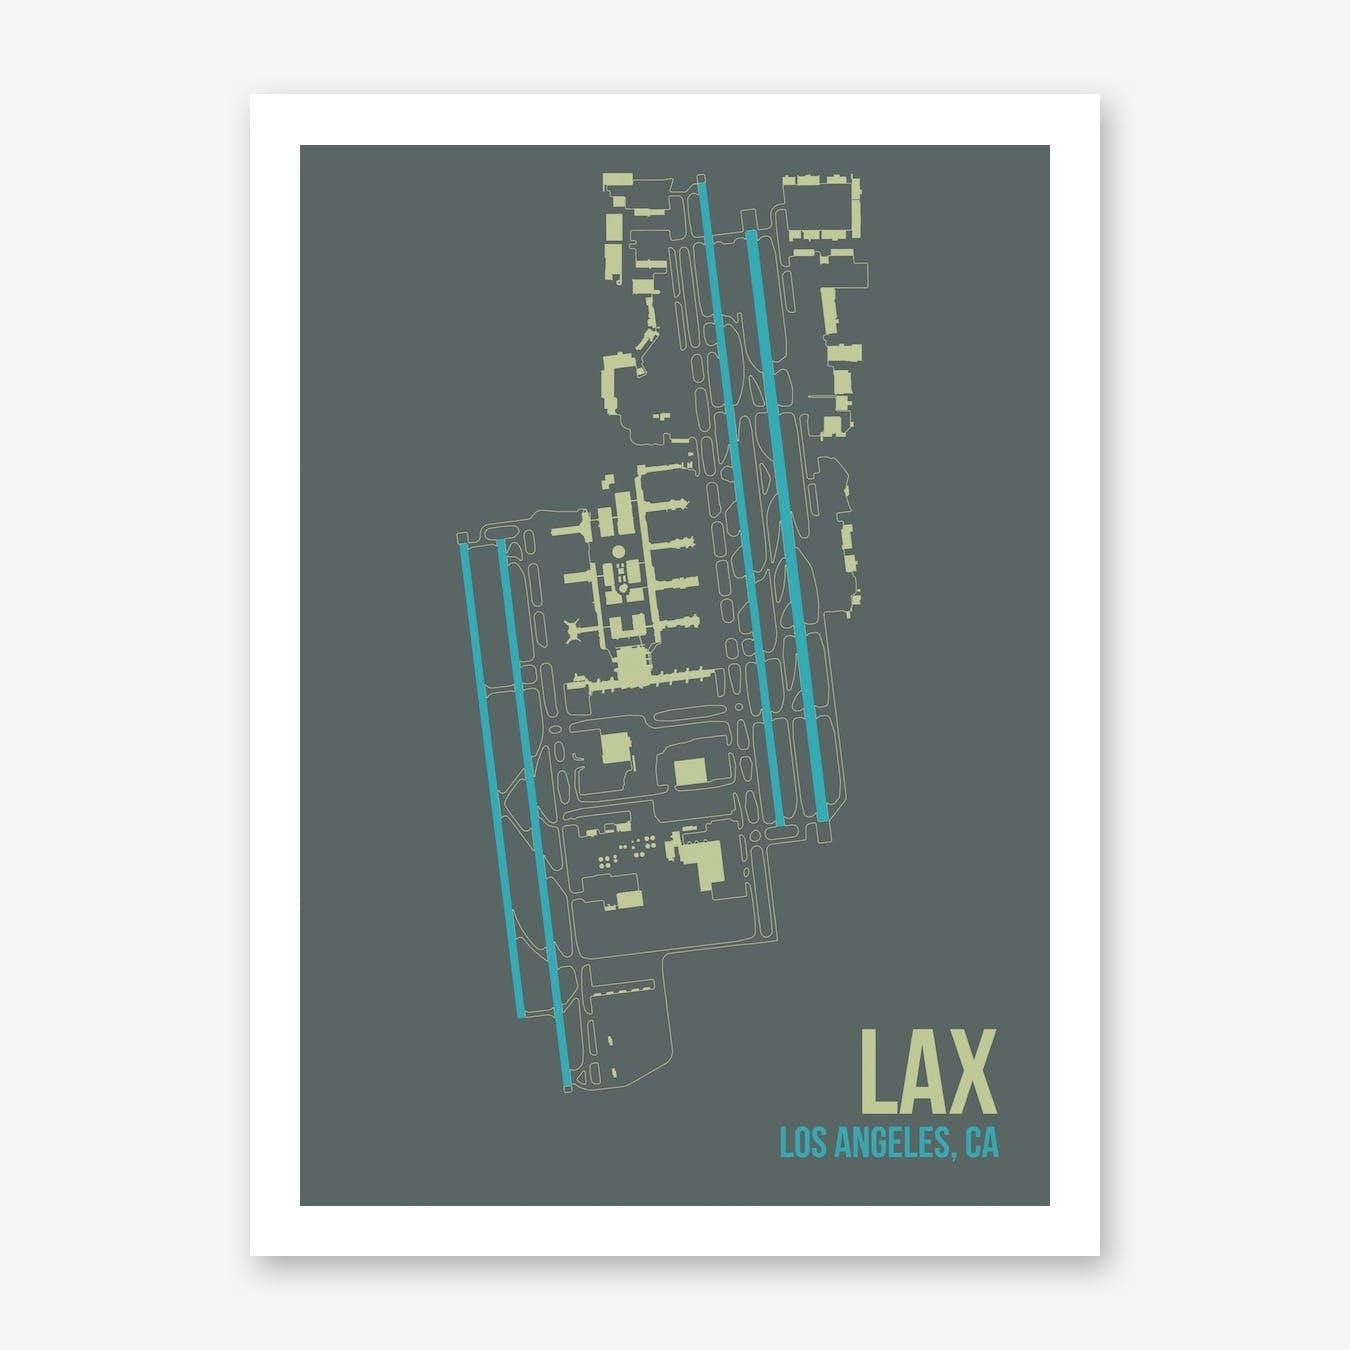 LAX Airport Layout Art Print